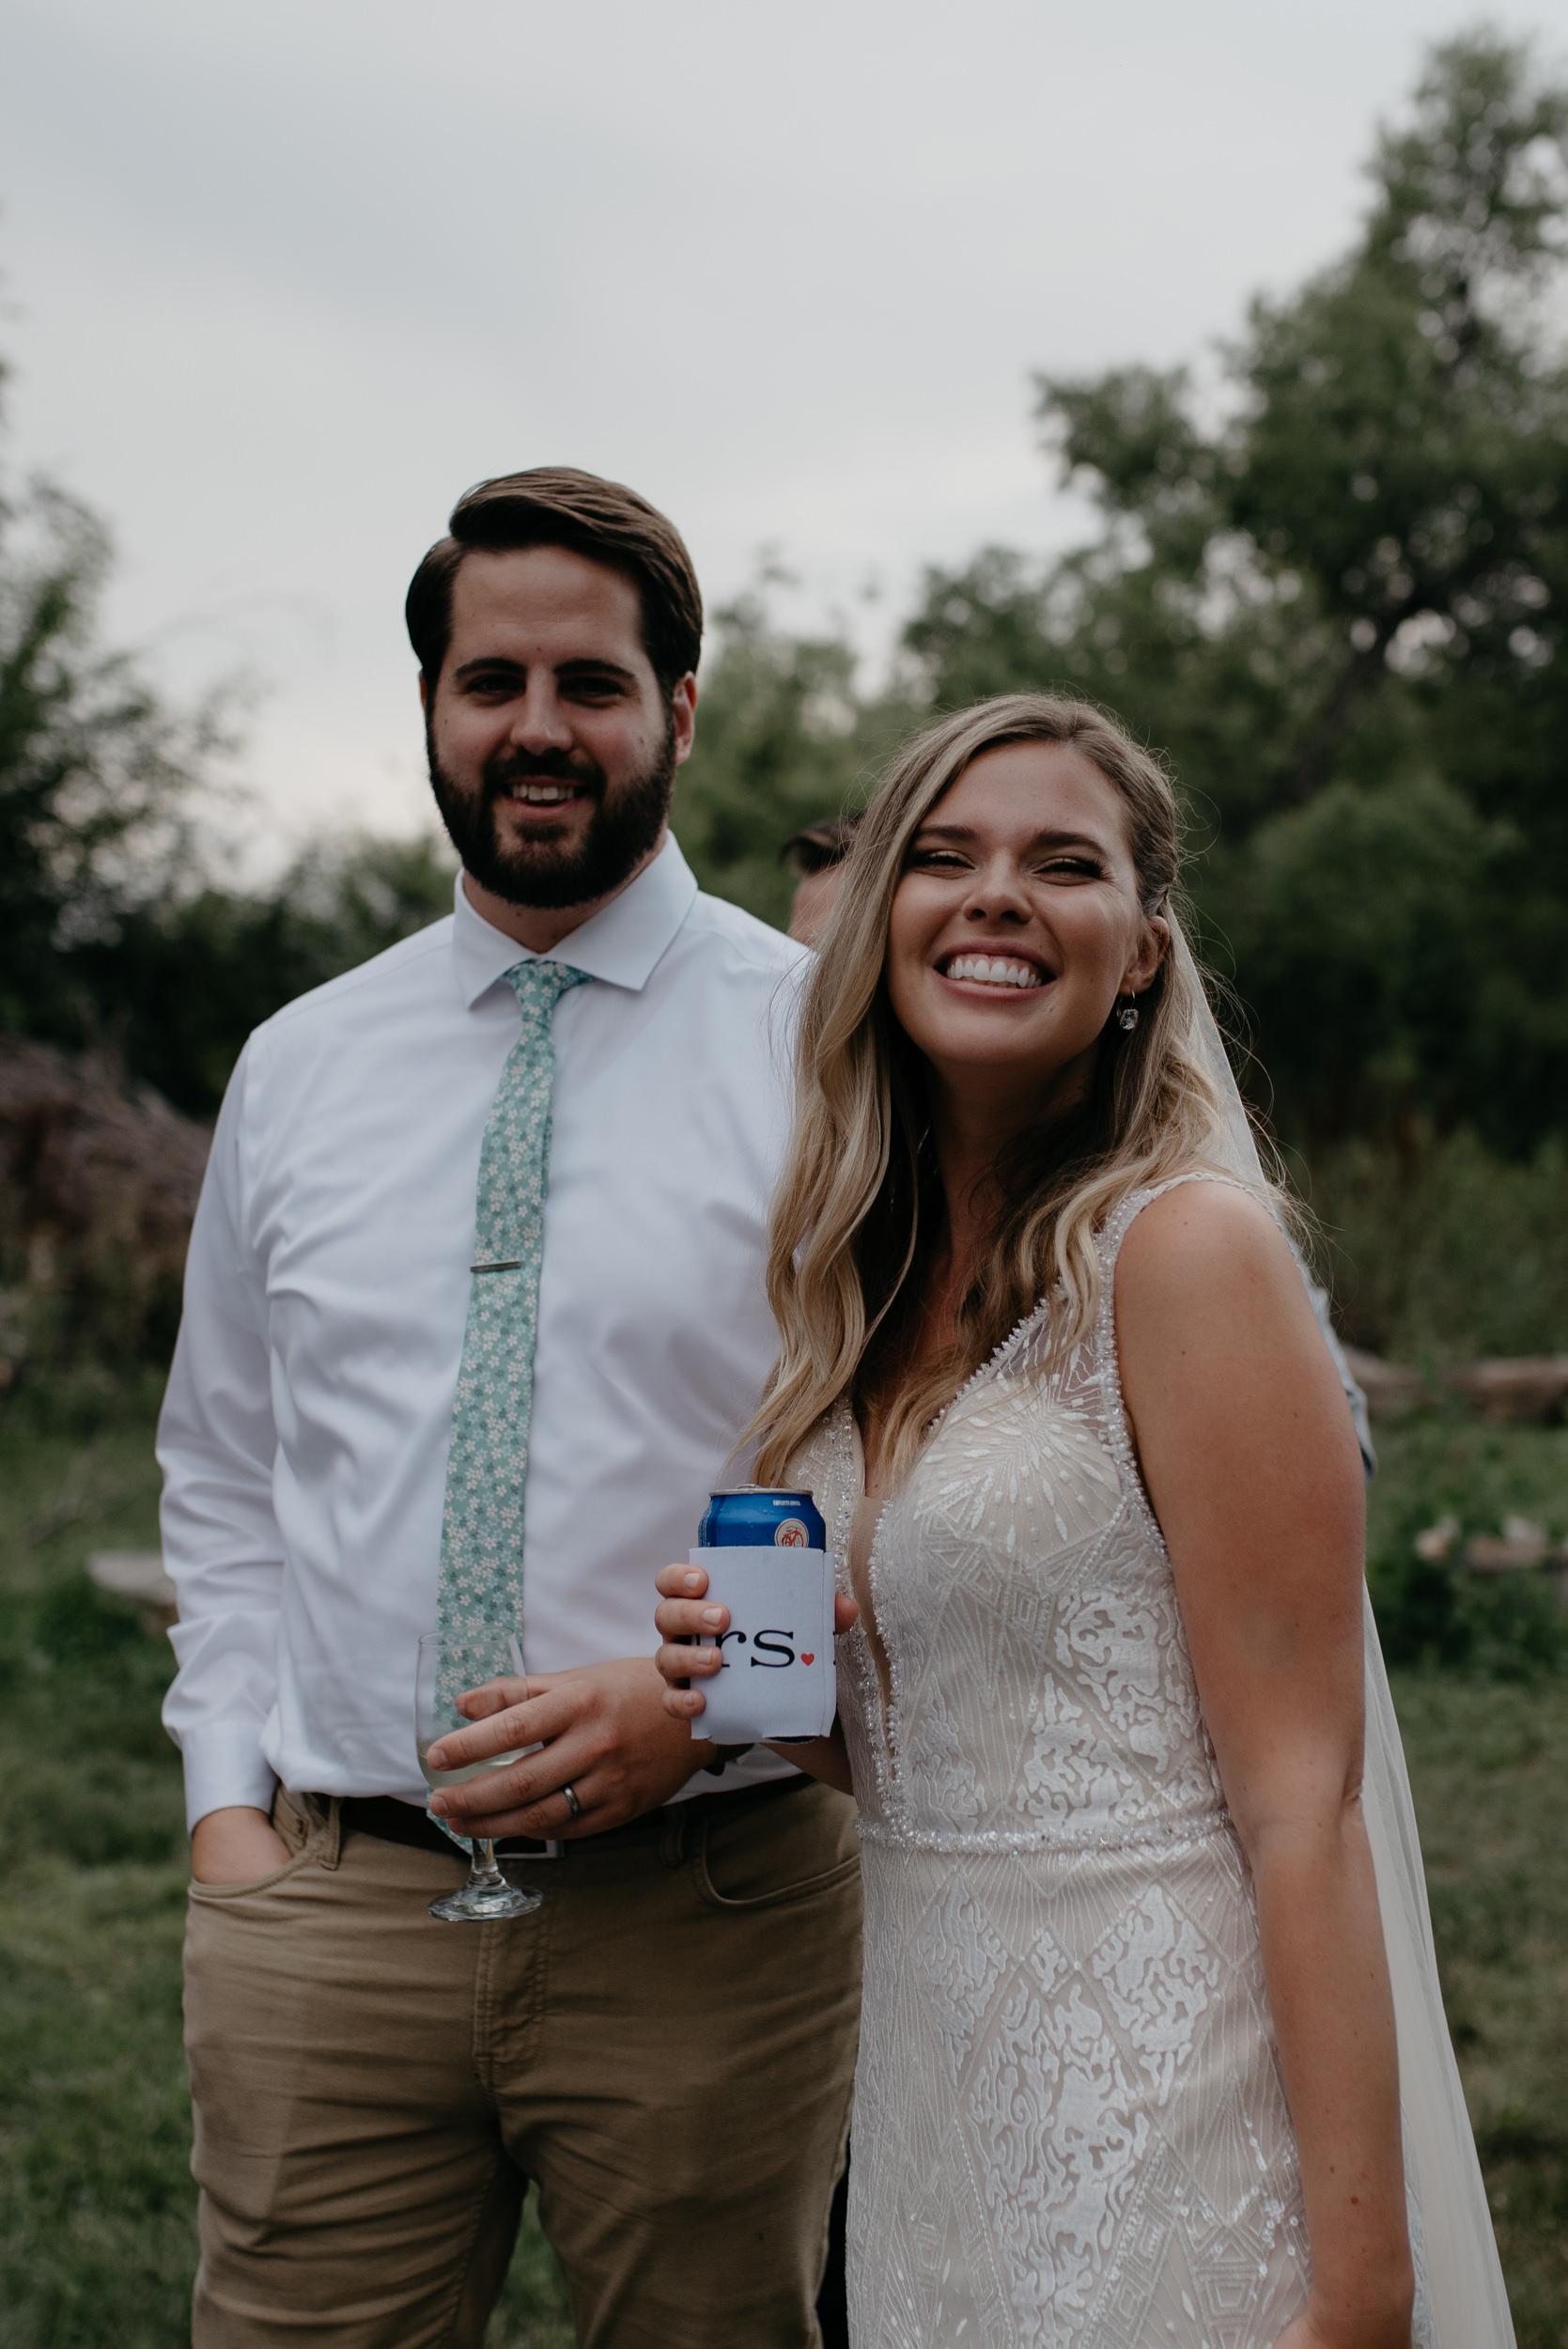 Boulder, Colorado based mountain wedding and elopement photographer.